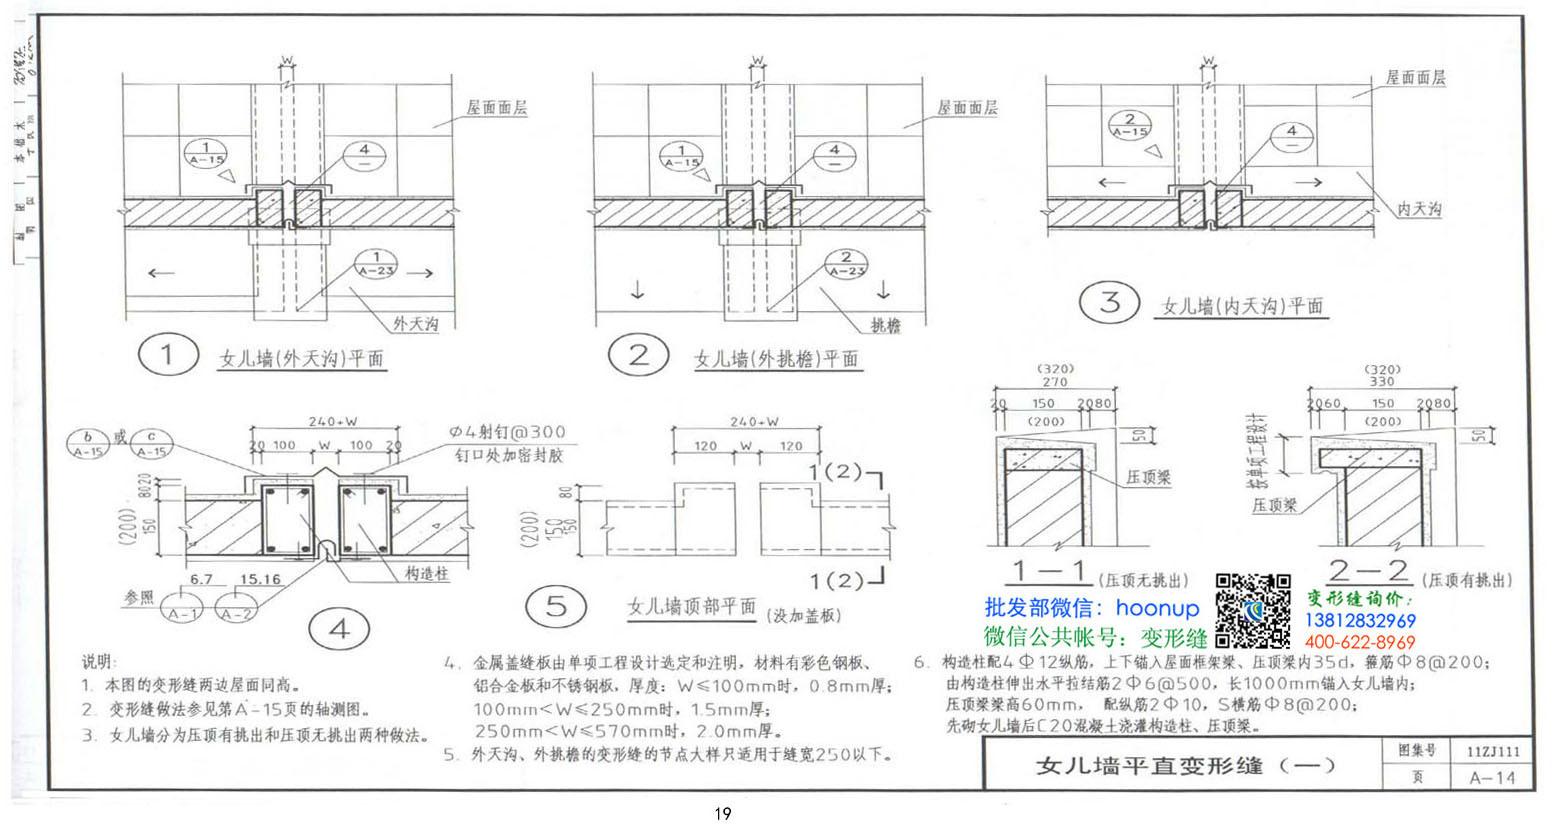 11ZJ111_变形缝建筑构造A-14